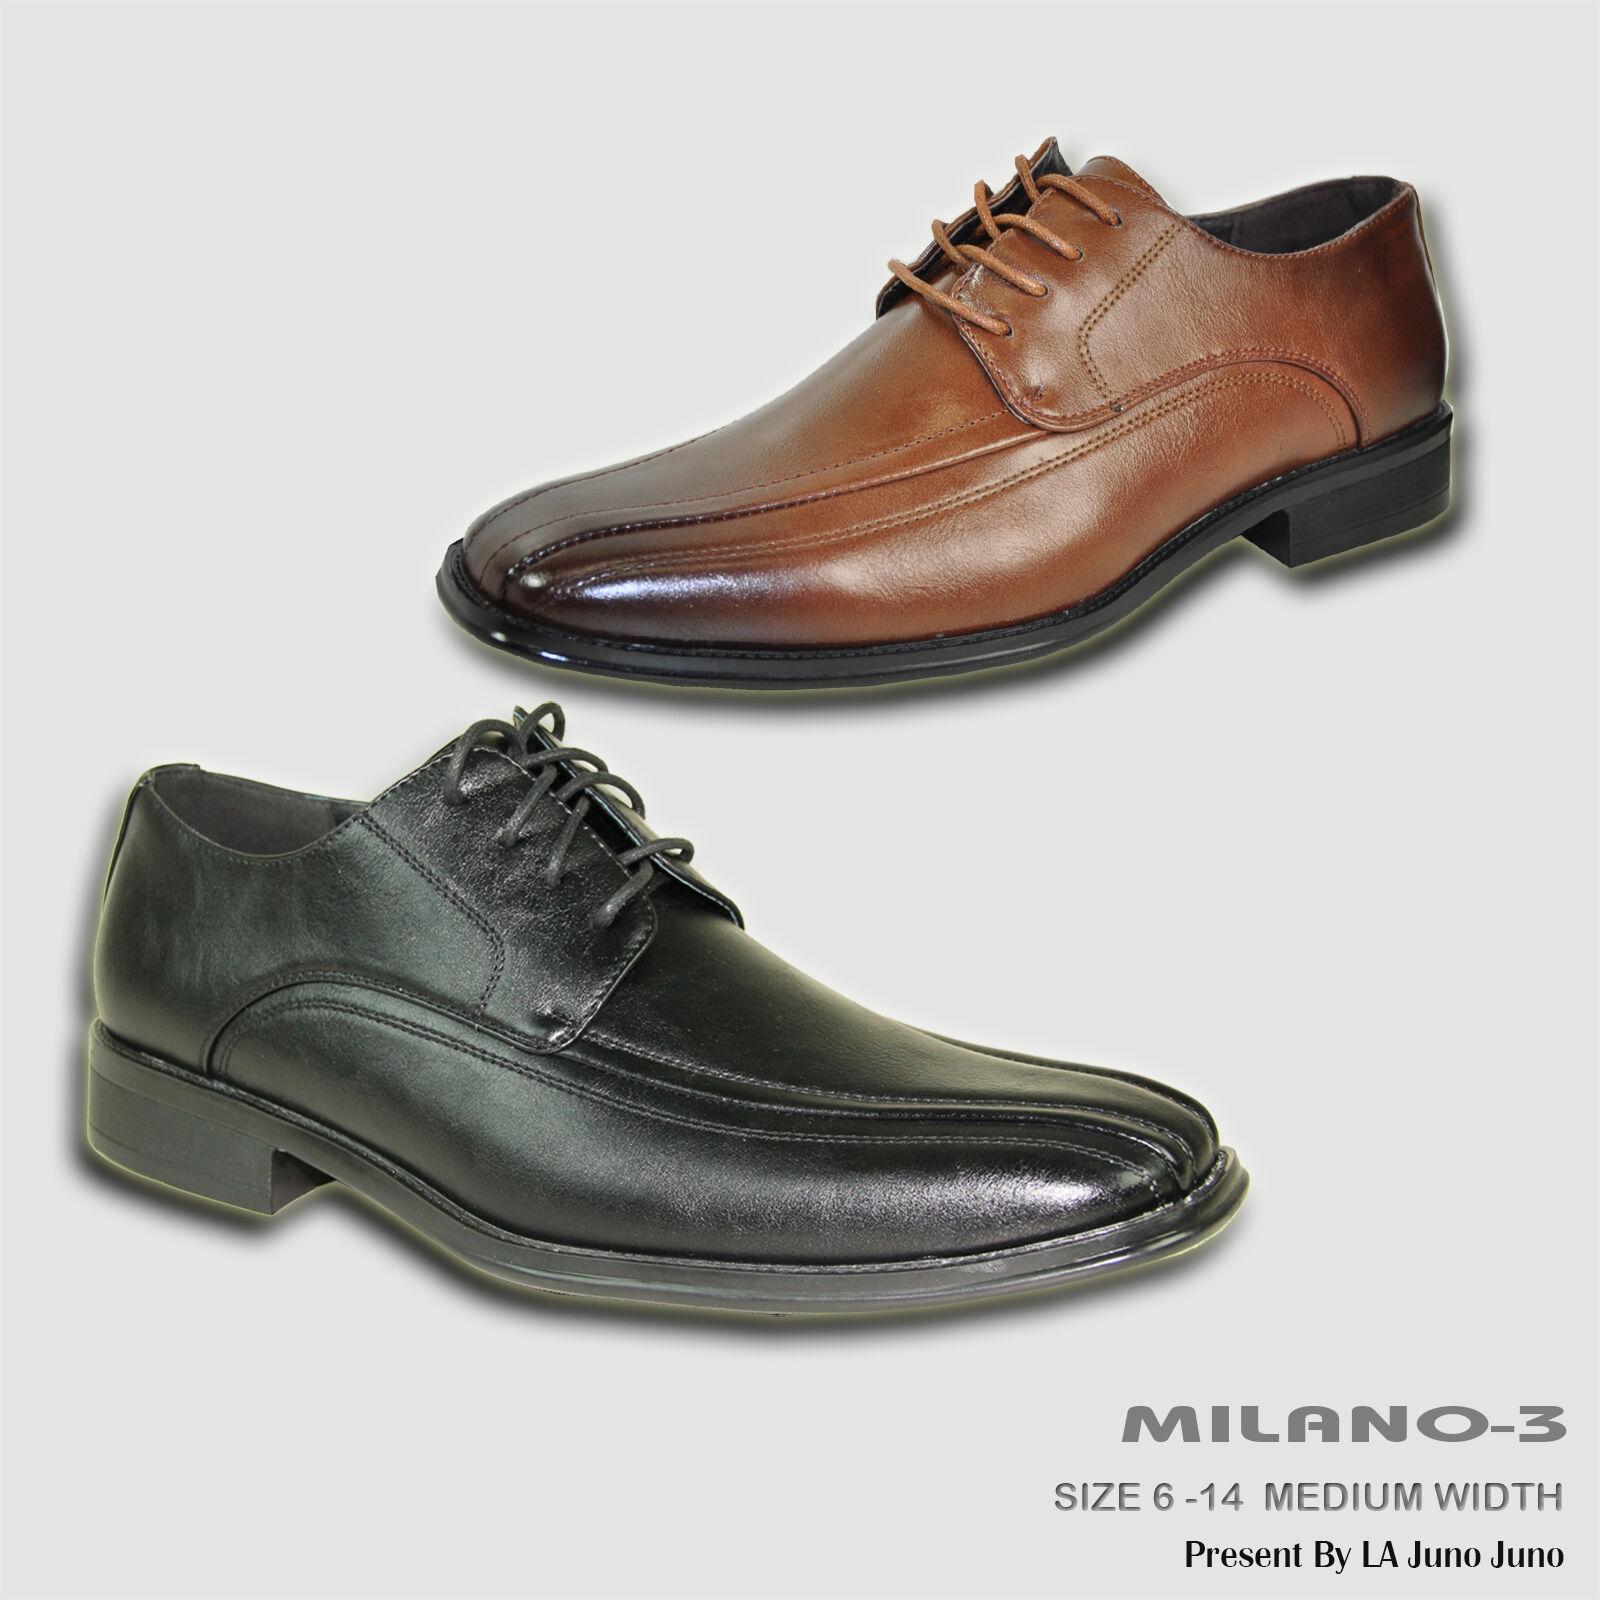 BRAVO New Uomo Dress Shoe MILANO-3 Oxford Double Runner Square Toe Pelle Lining